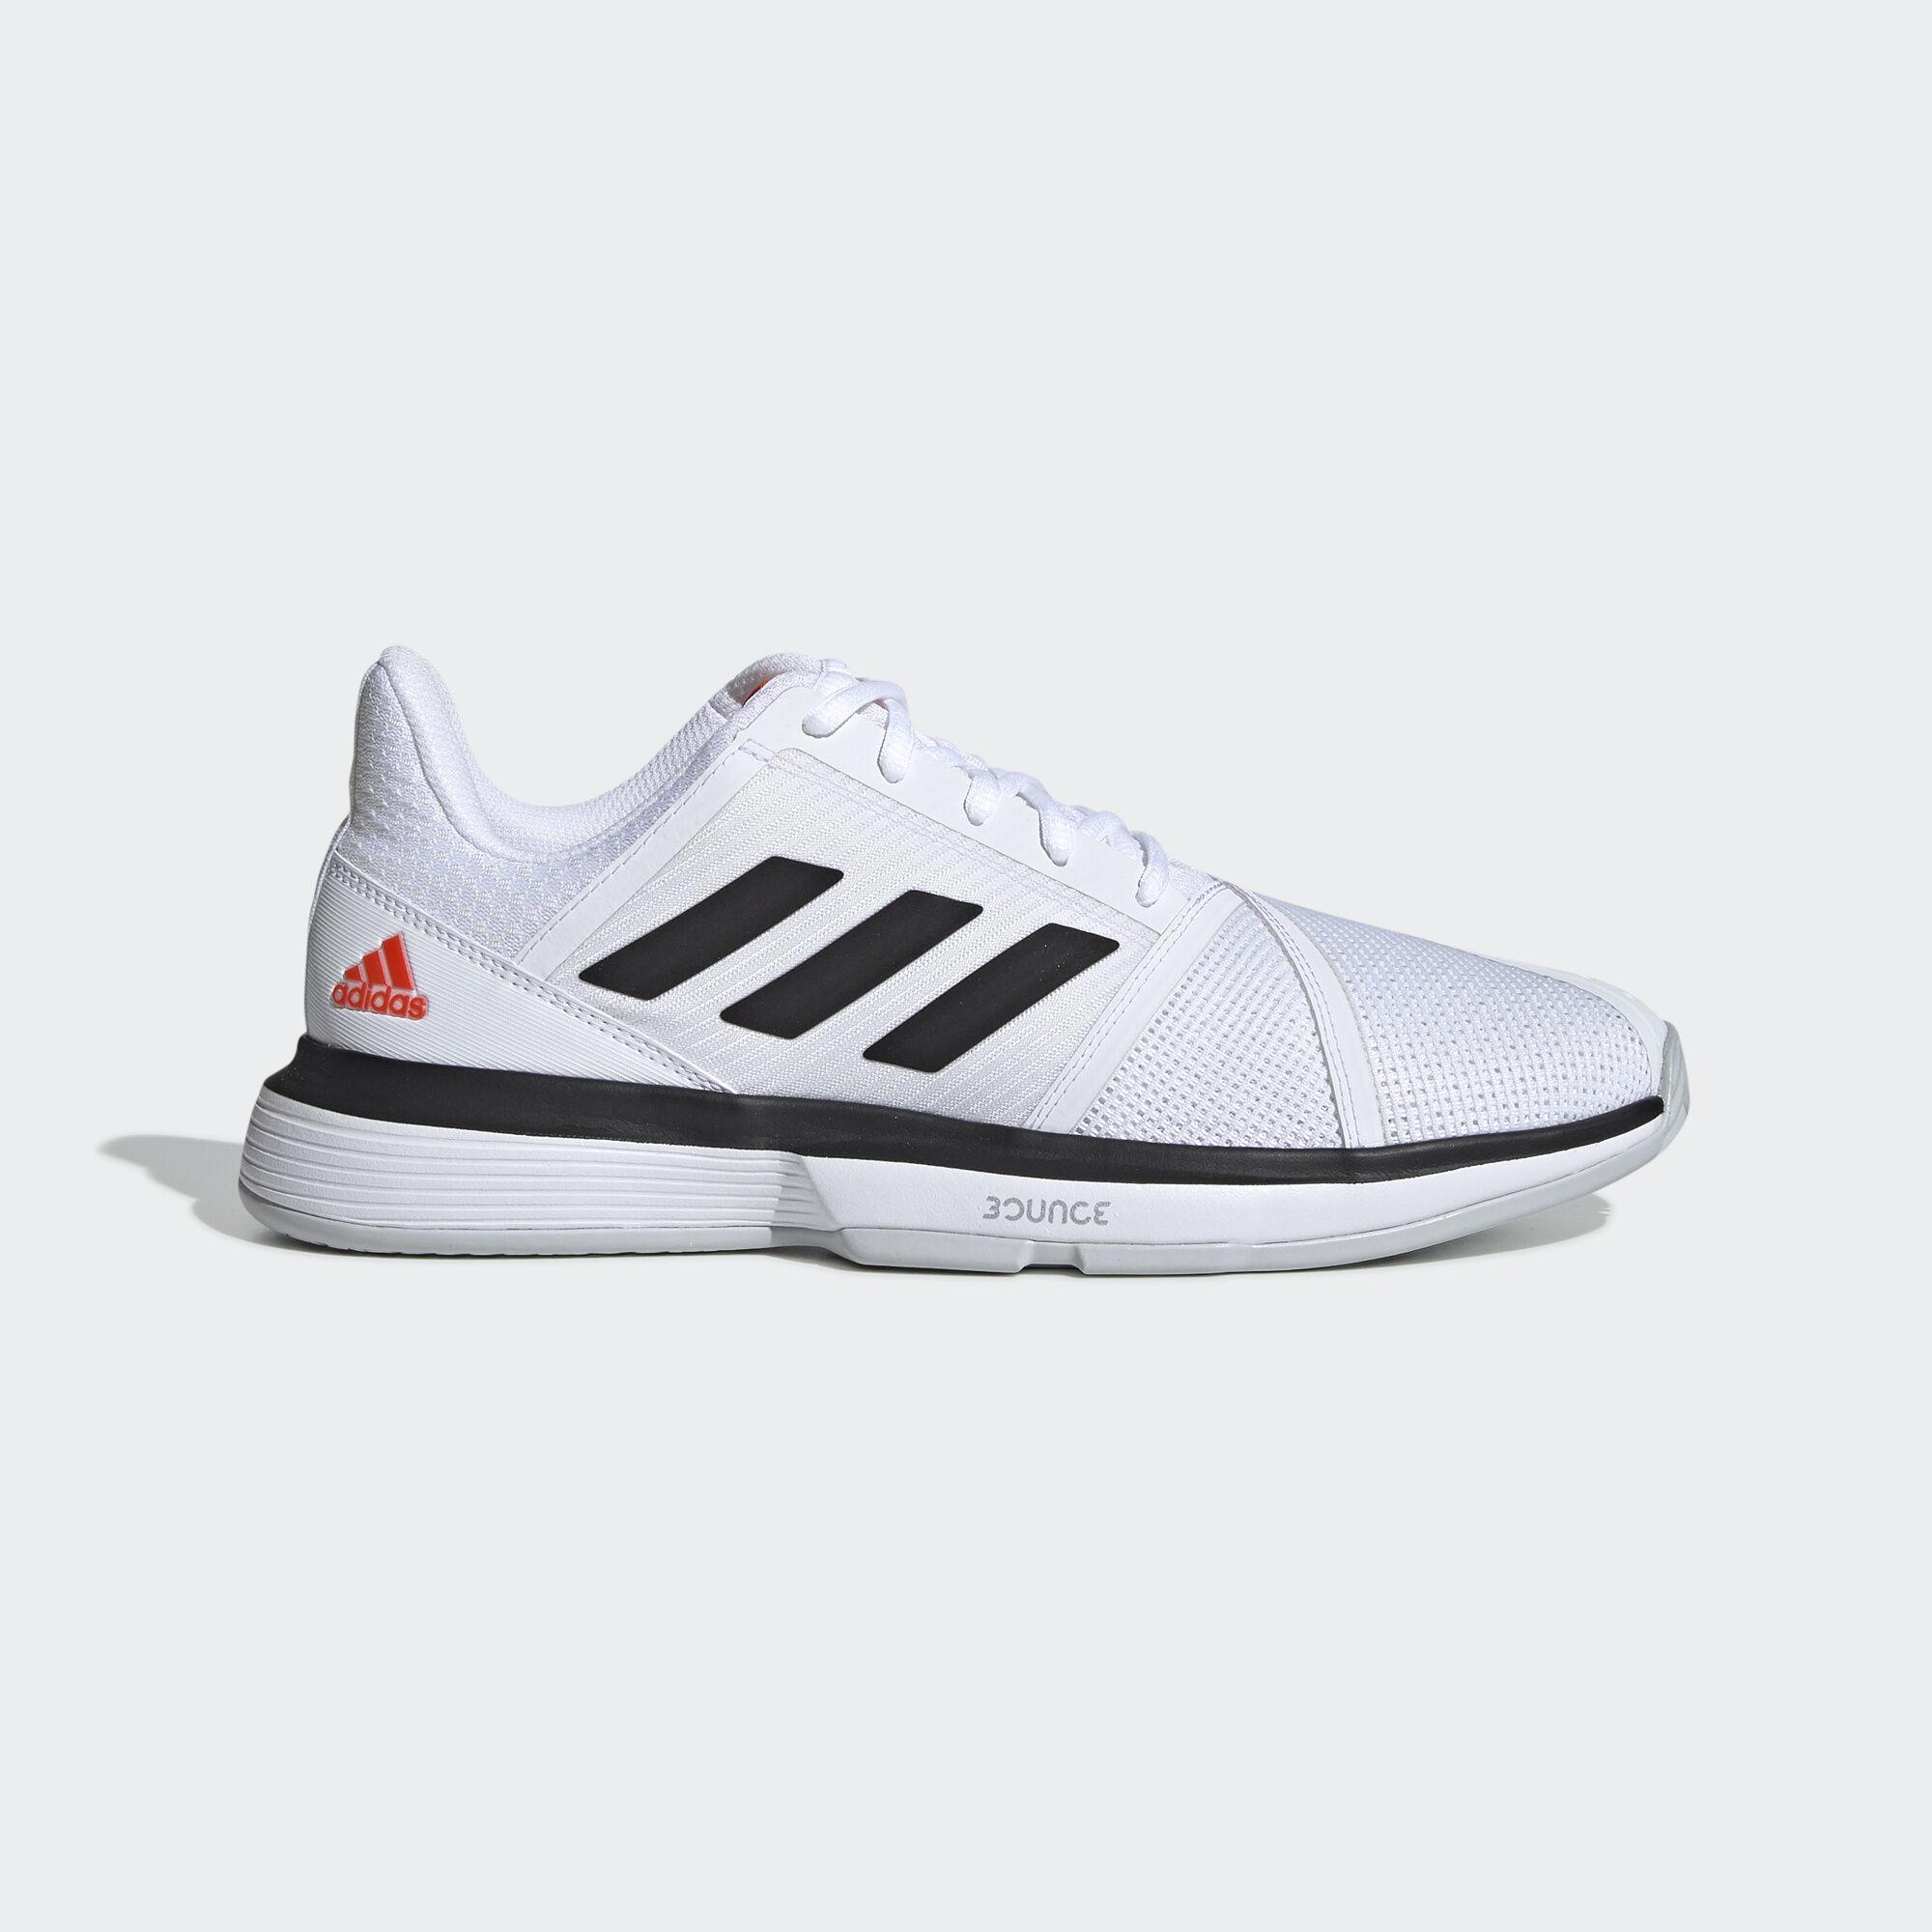 Adidas Mens CourtJam Bounce Tennis